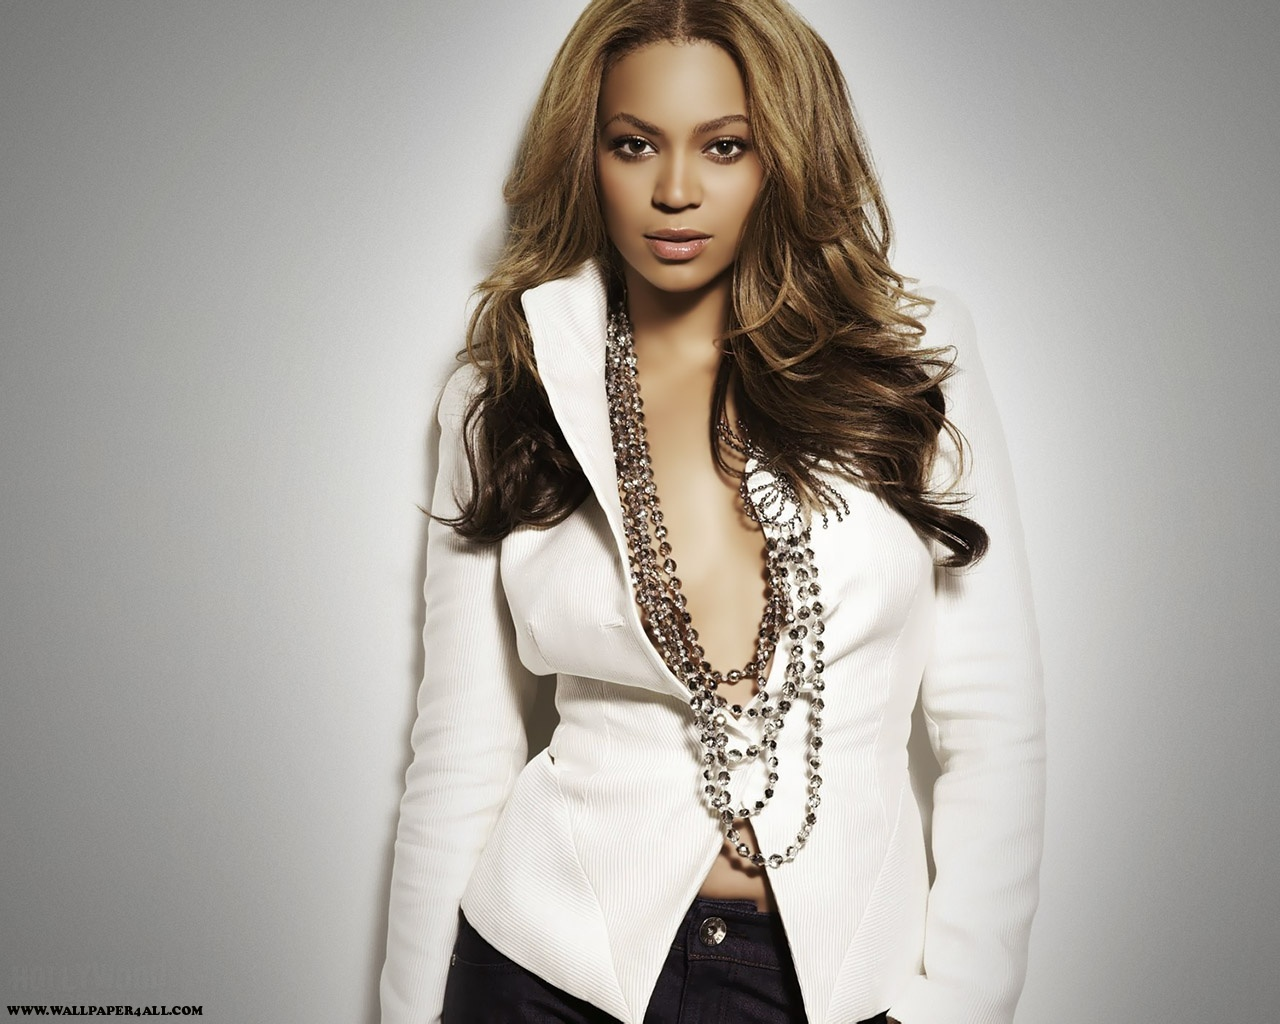 http://2.bp.blogspot.com/-FuWU_ooPSXY/TZGPeCqrb9I/AAAAAAAAAN8/p2v-eXFu85E/s1600/Beyonce2.jpg